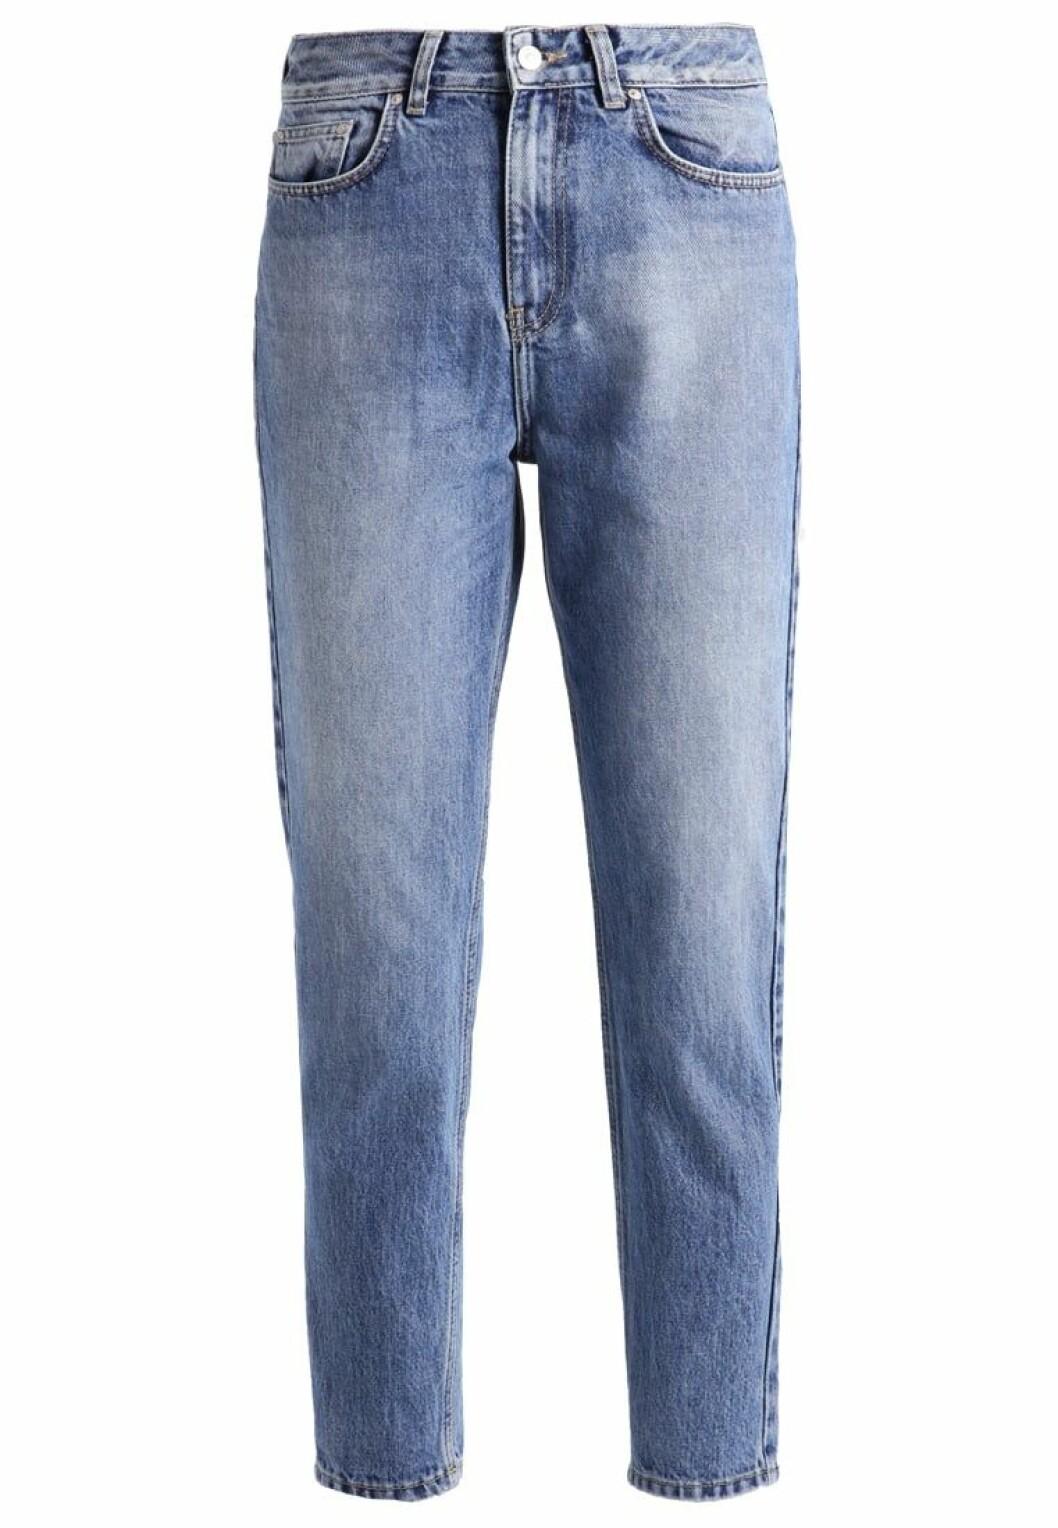 mom jeans avslappnade